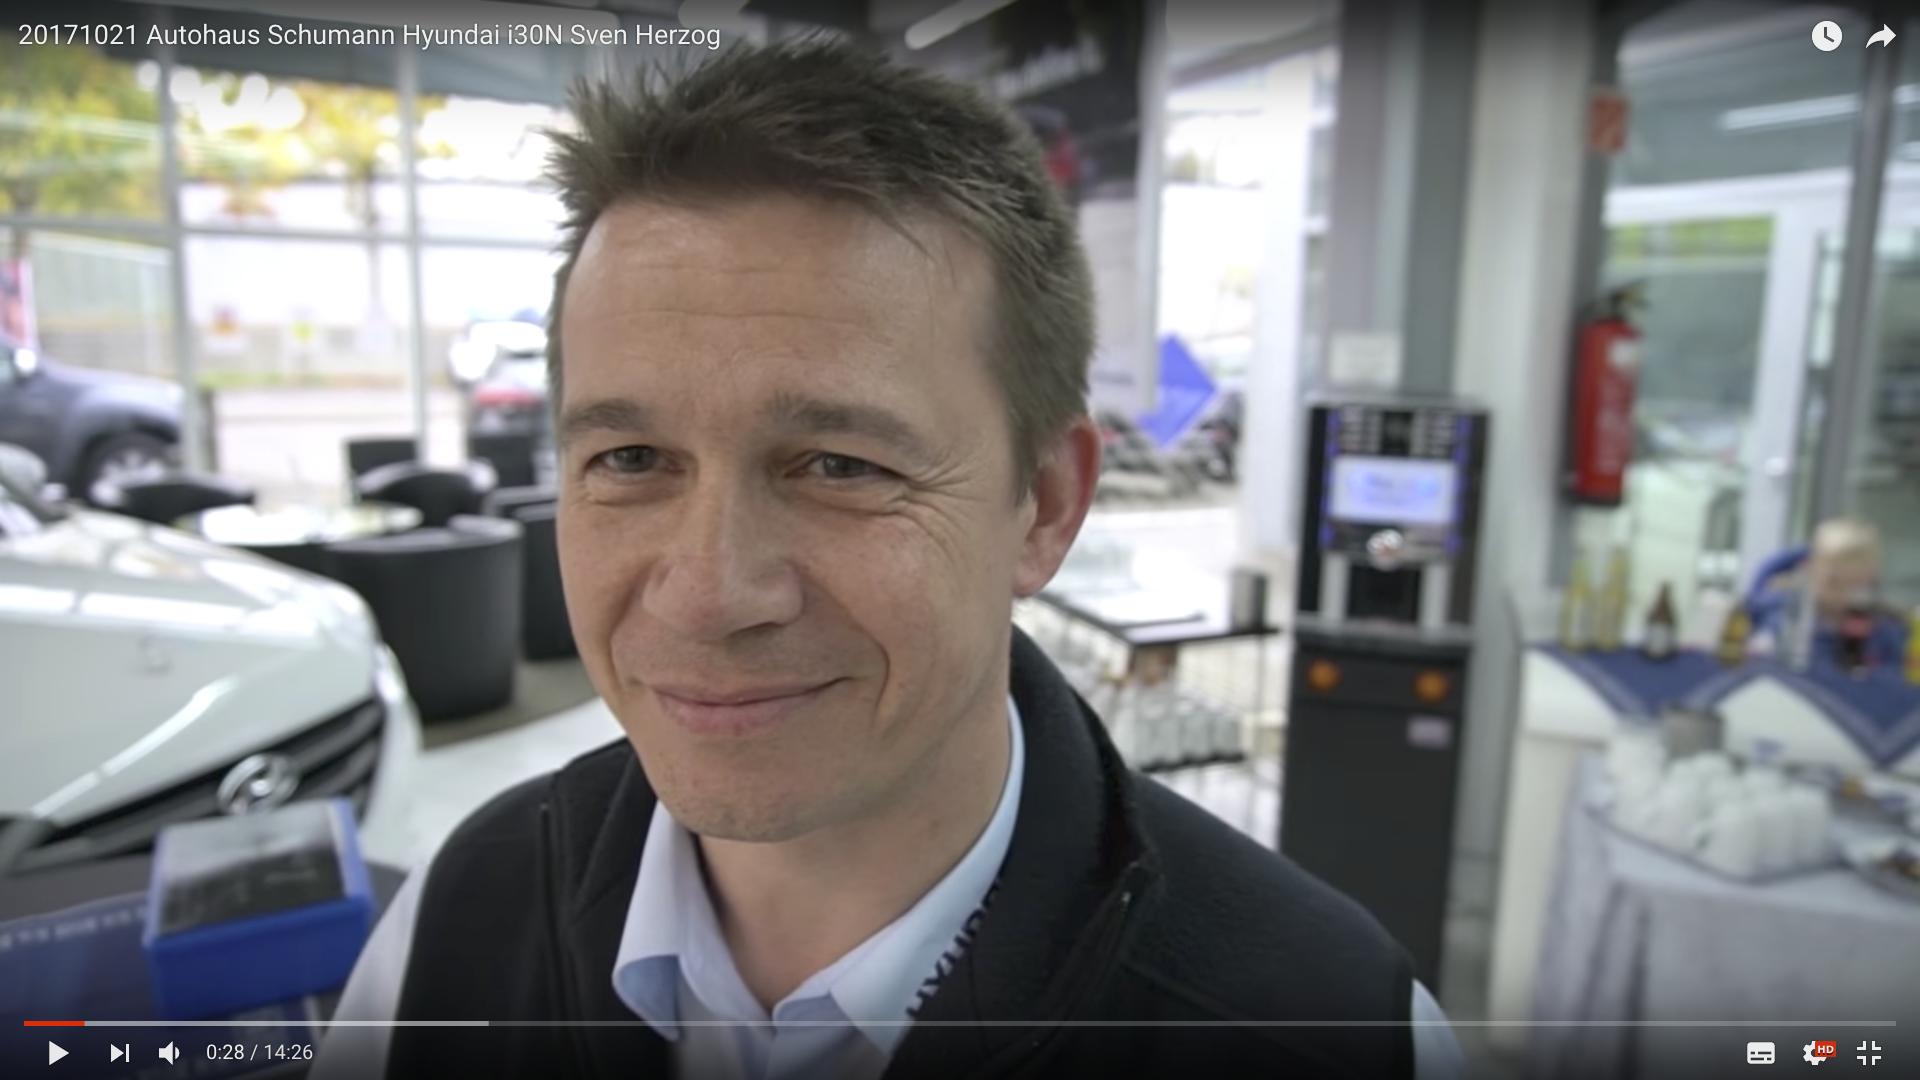 2017 Autohaus Schumann Hyundai i30N Thomas JakobsKüche_MSM_MEDIEN_SAAR_MOSEL_SAARLAND_FERNSEHEN_1_ED_SAAR